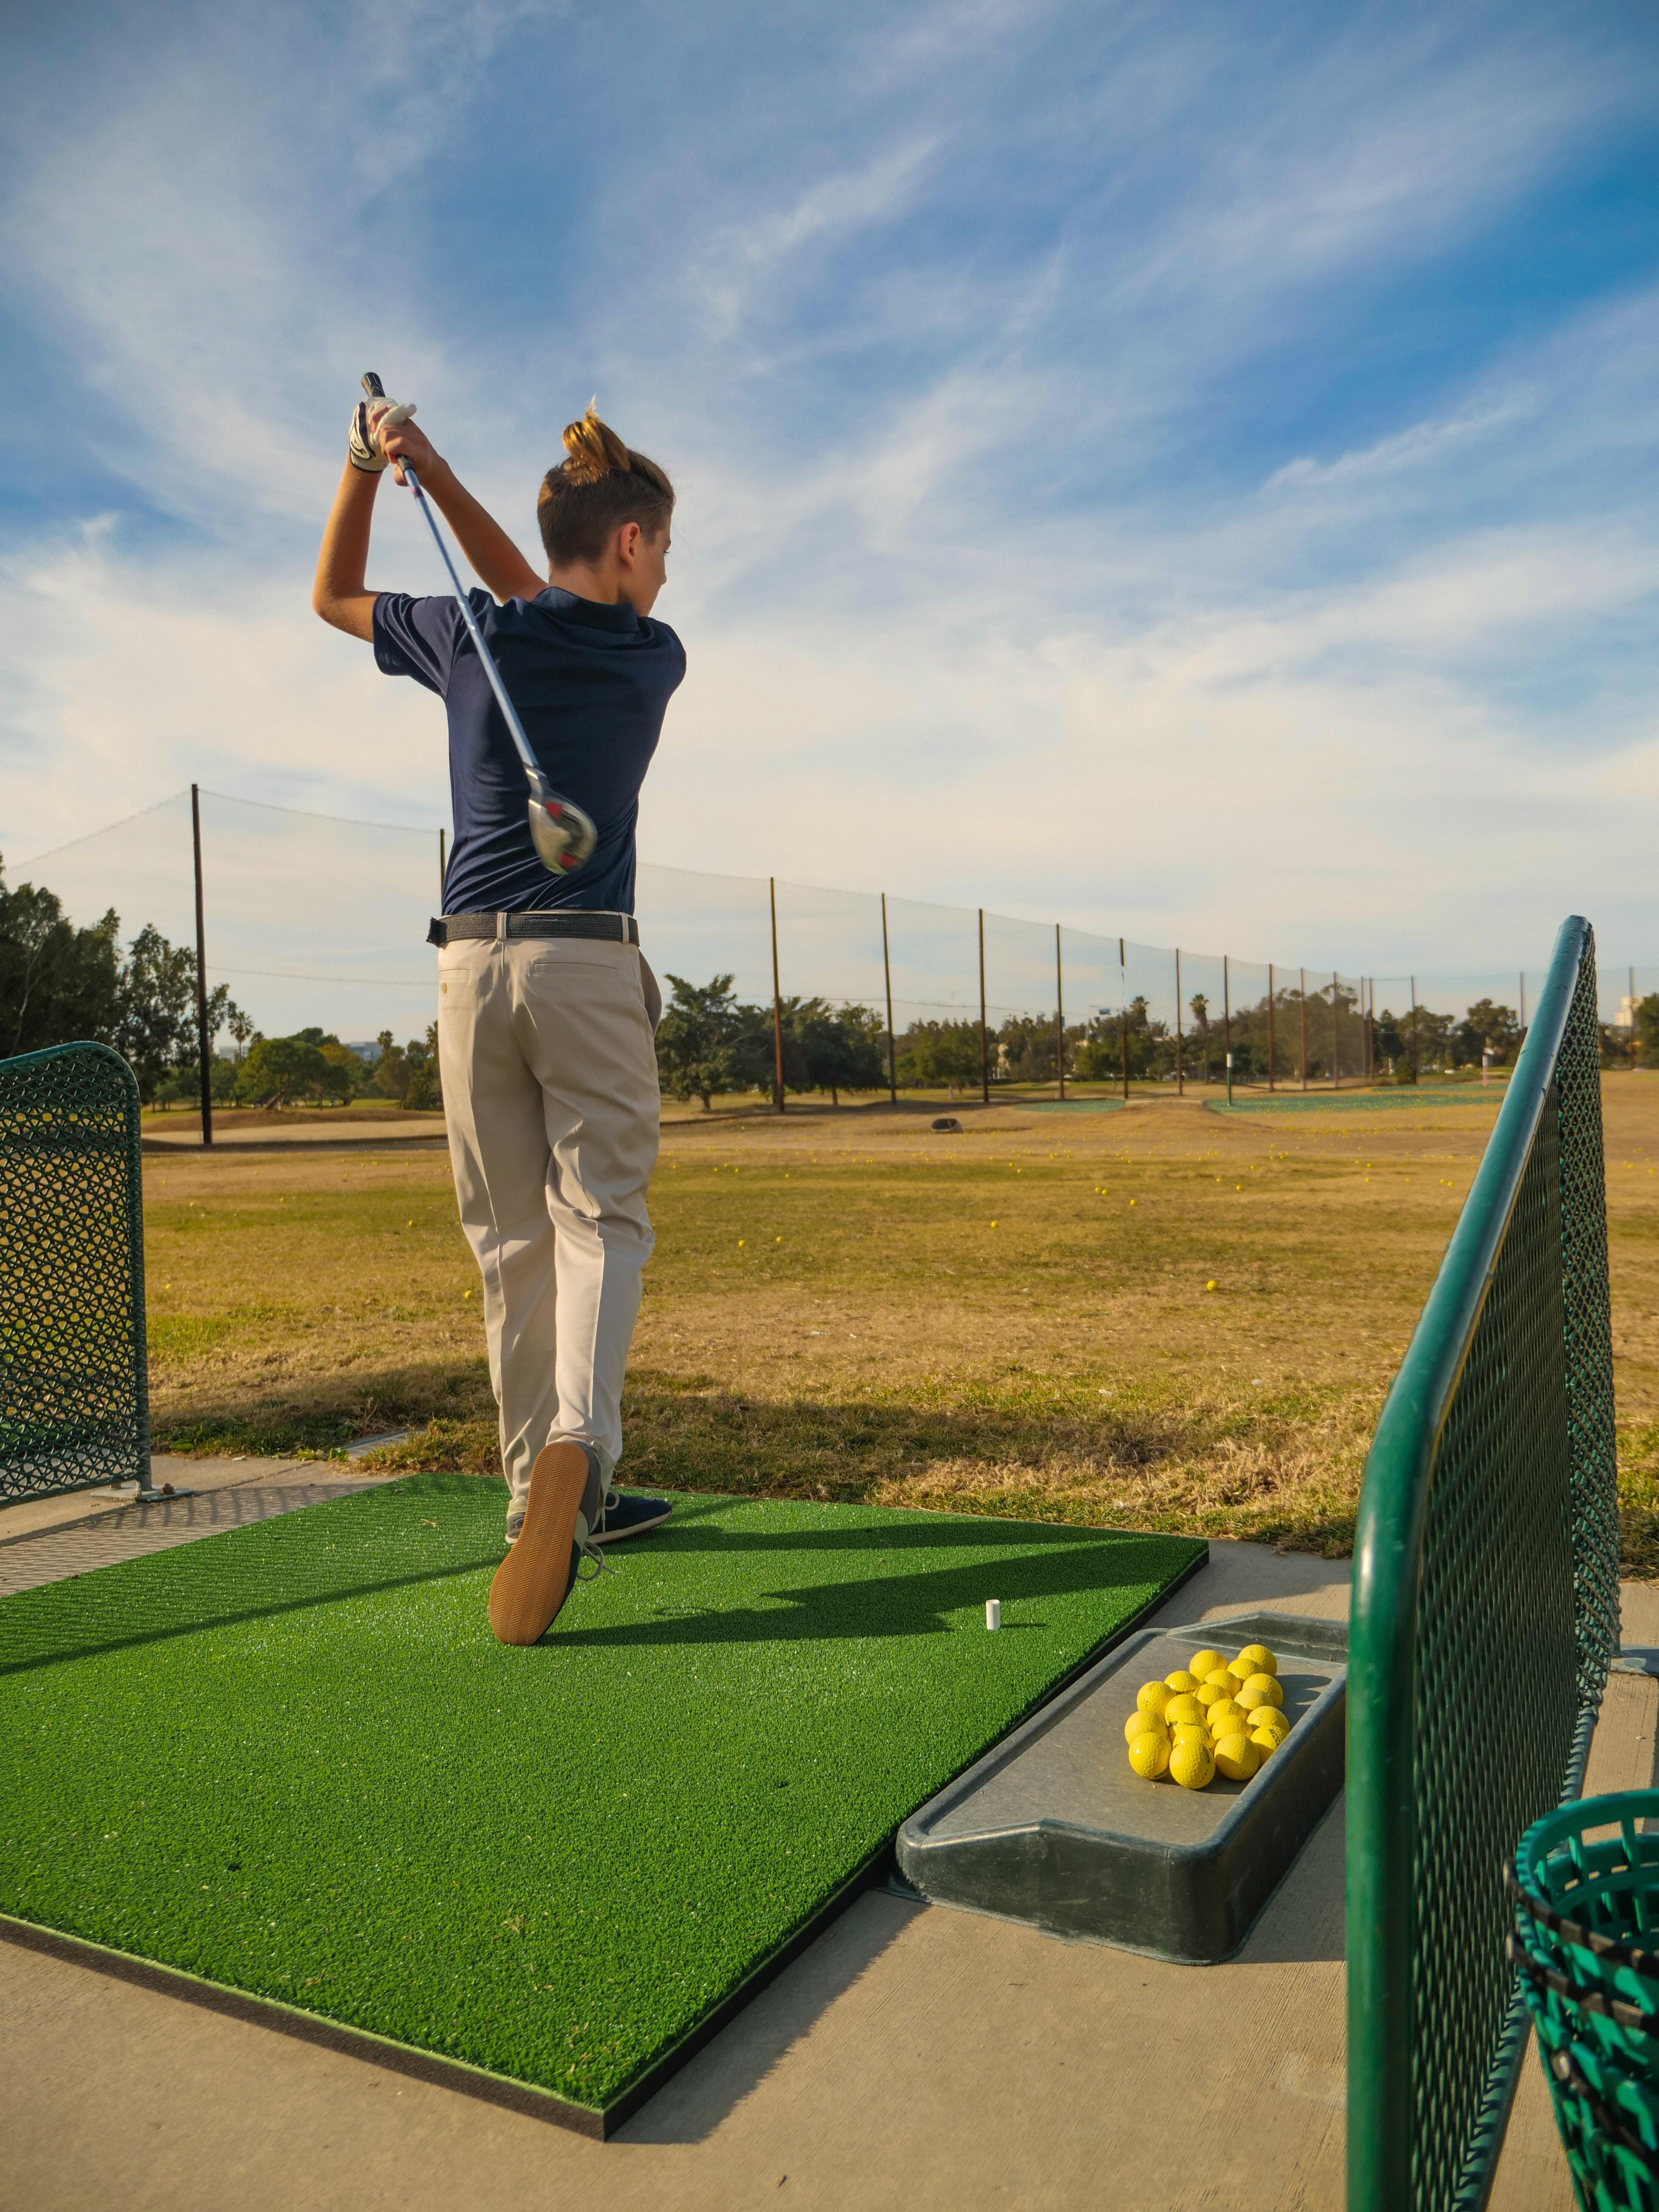 Golf - Driving Range Equipment & Supplies - PRICE REDUCED